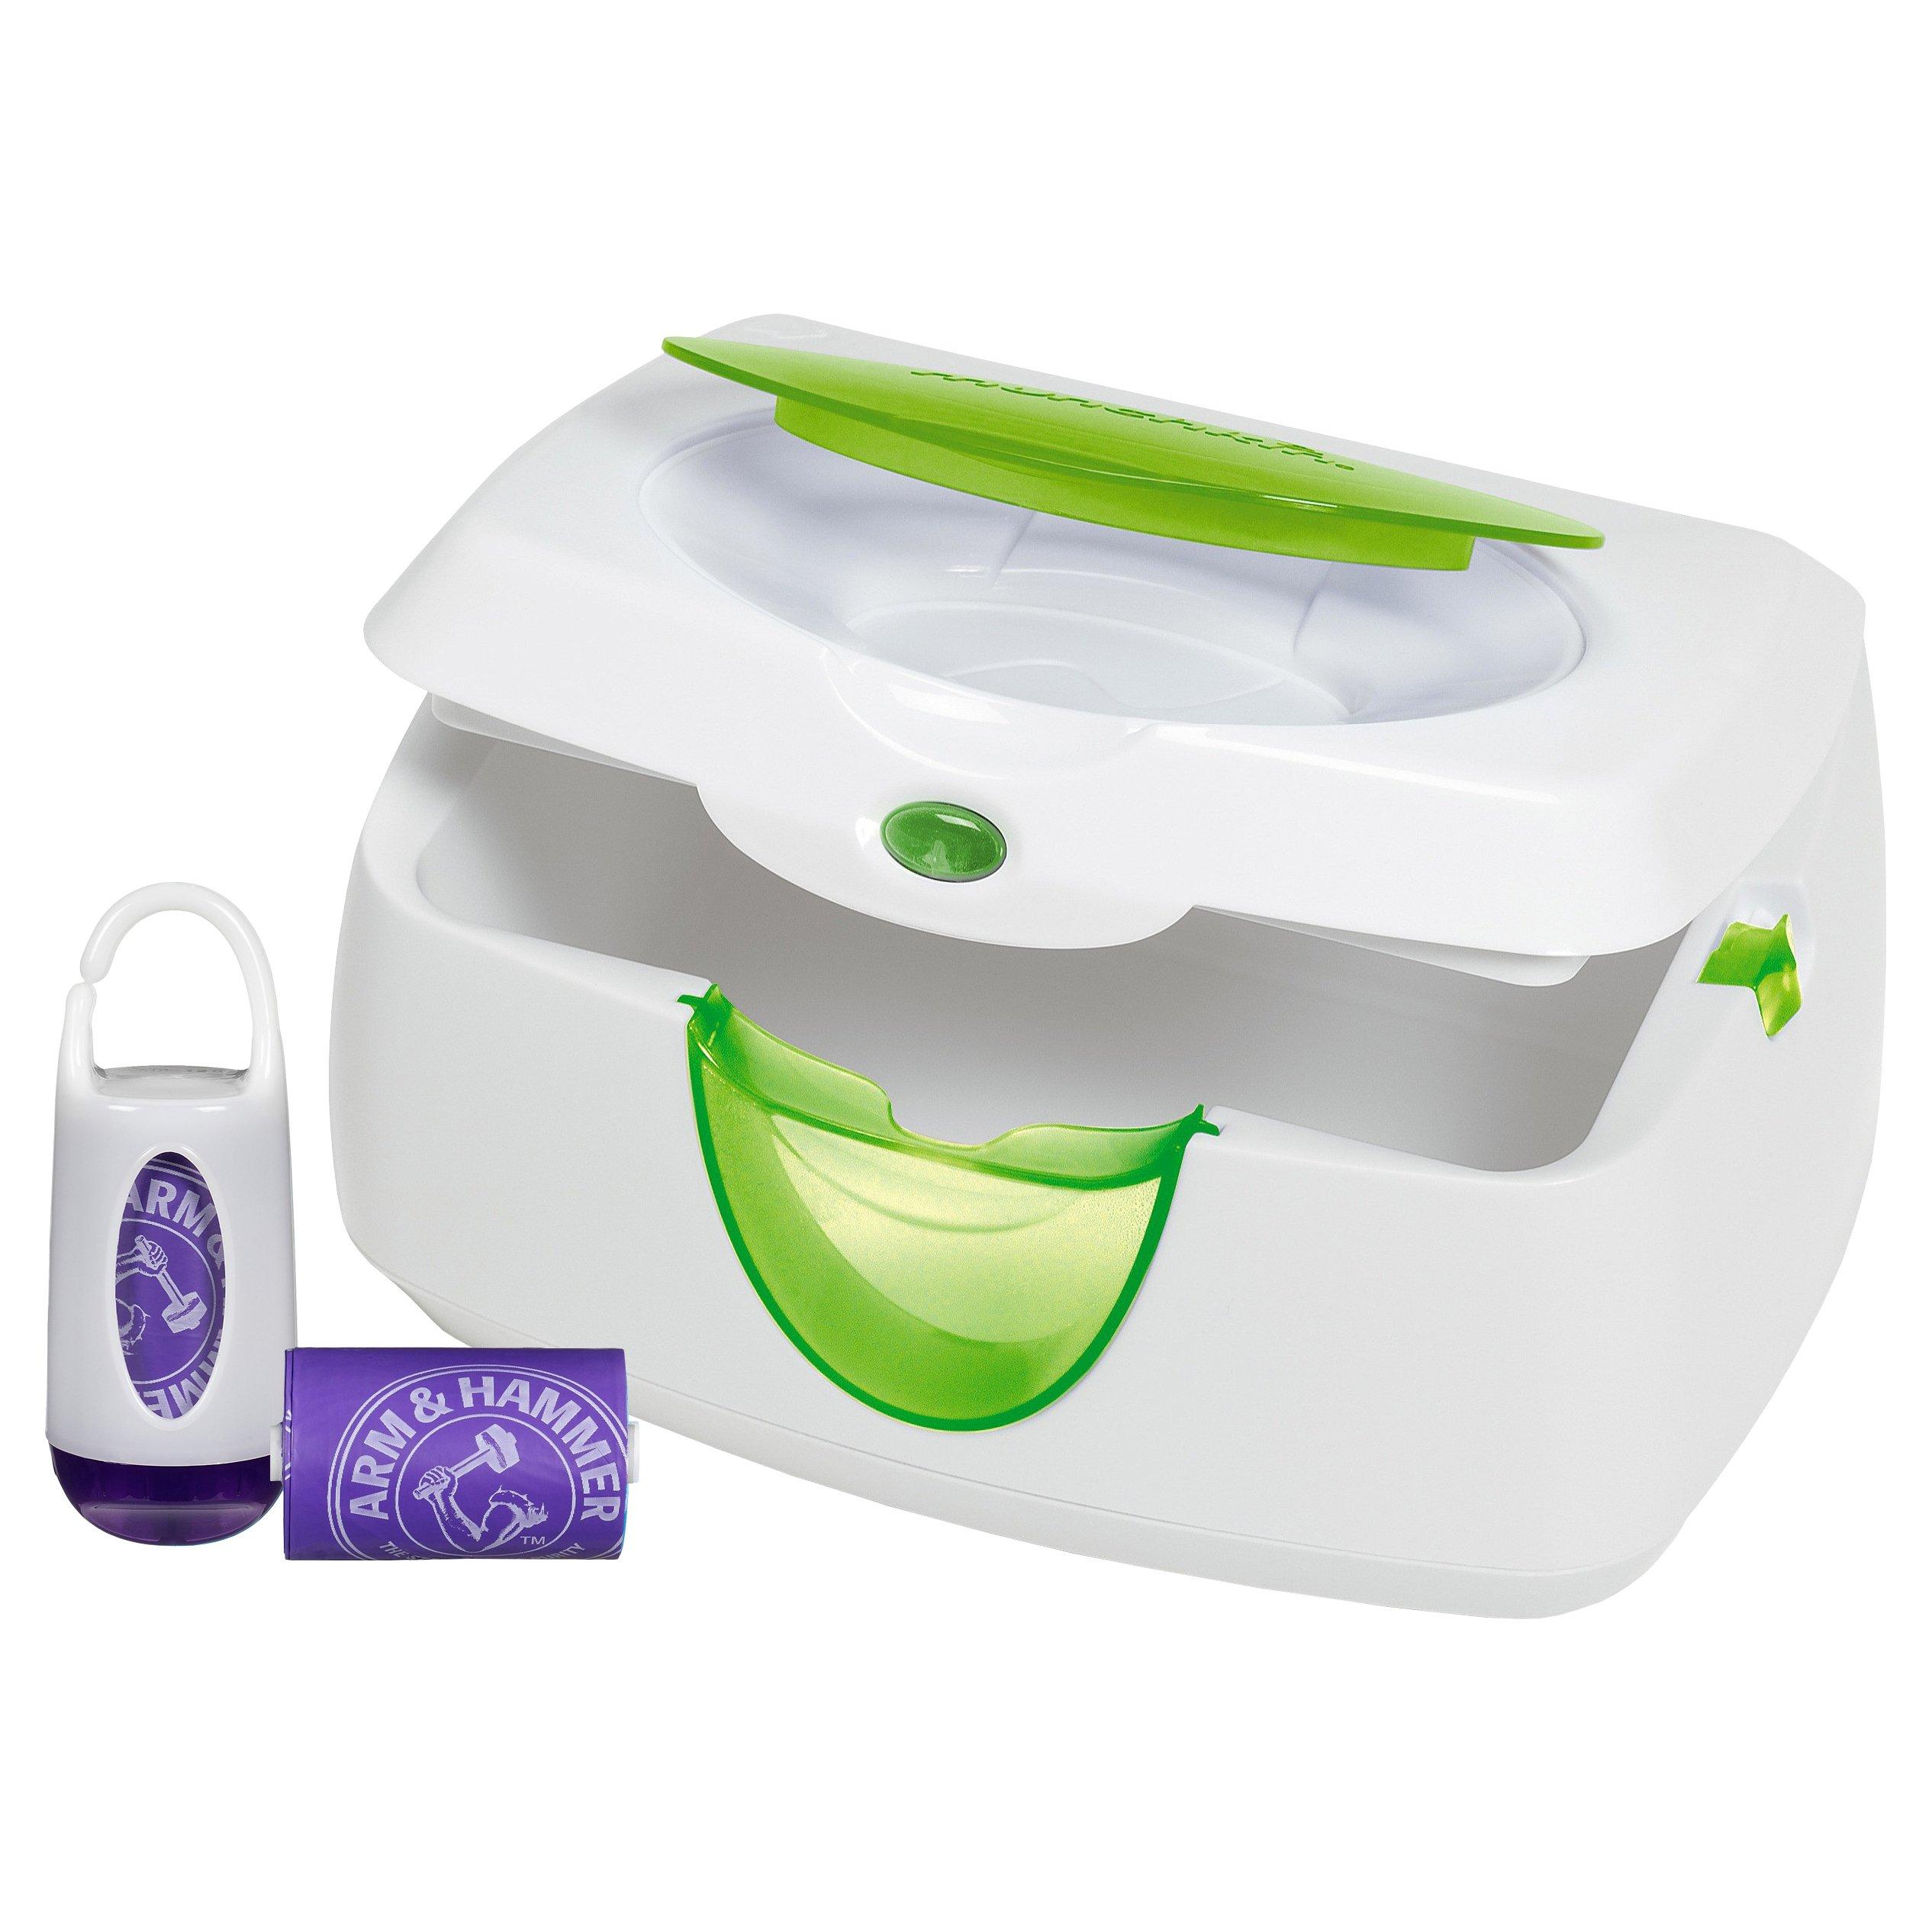 Munchkin Warm Glow Wipe Warmer and Diaper Bag Dispenser Set (Purple)